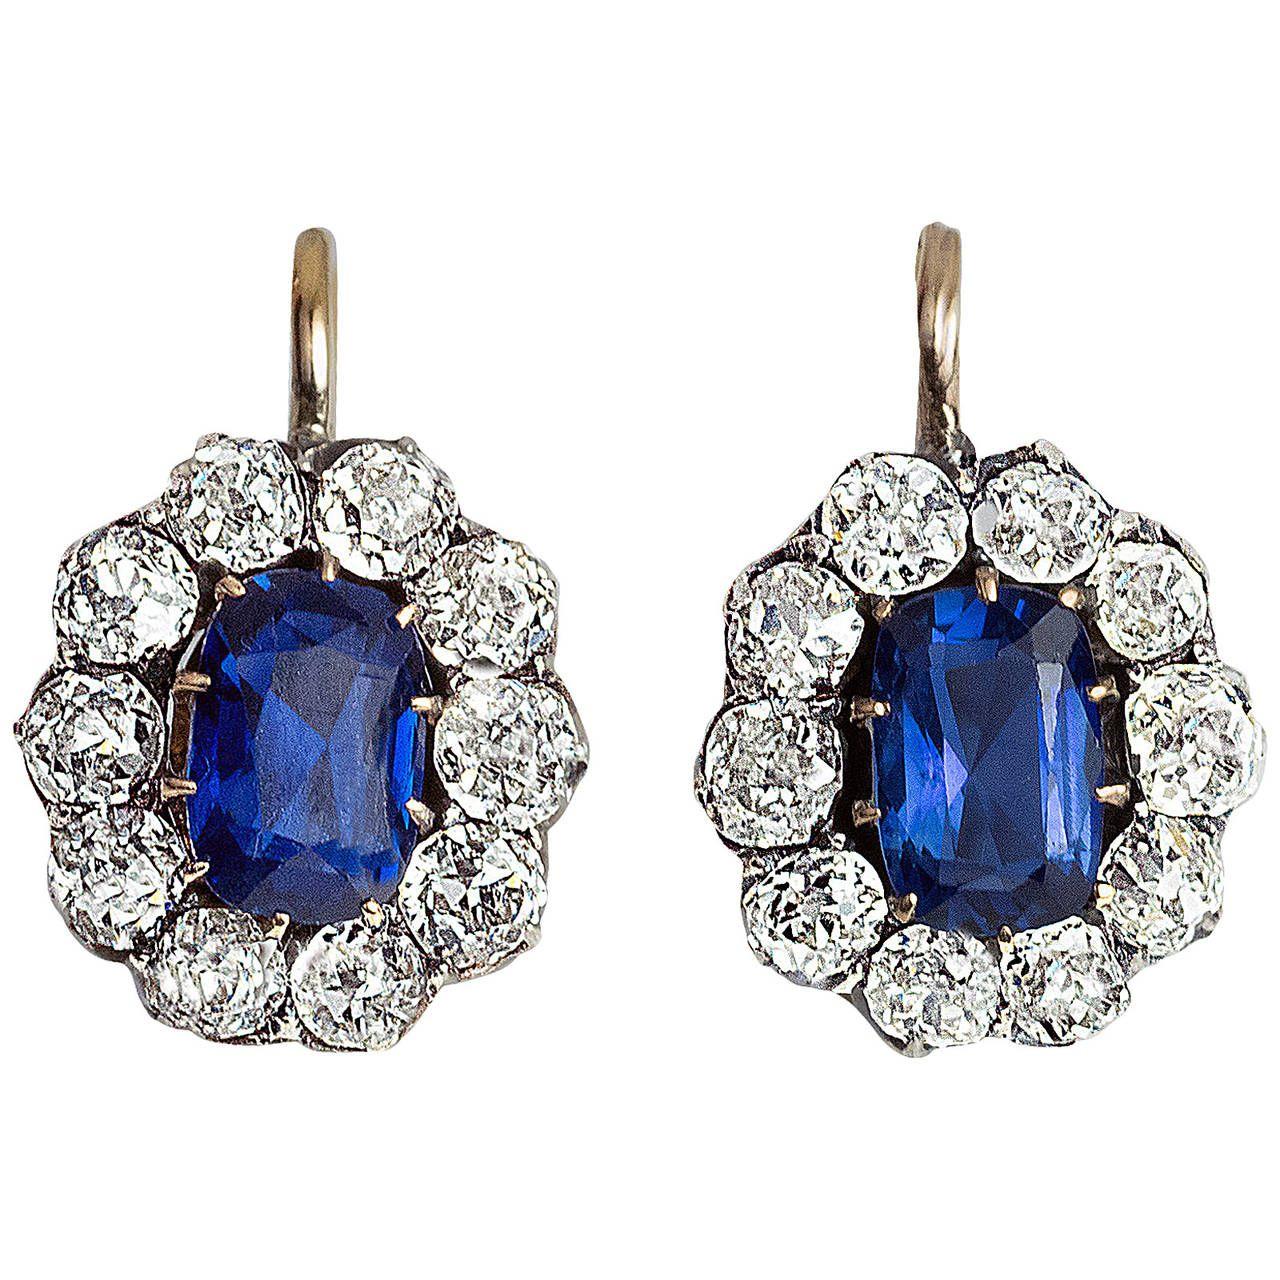 Antique Russian Sapphire Diamond Gold Cluster Earrings Antique Diamond Earrings Blue Diamond Earrings Sapphire And Diamond Earrings